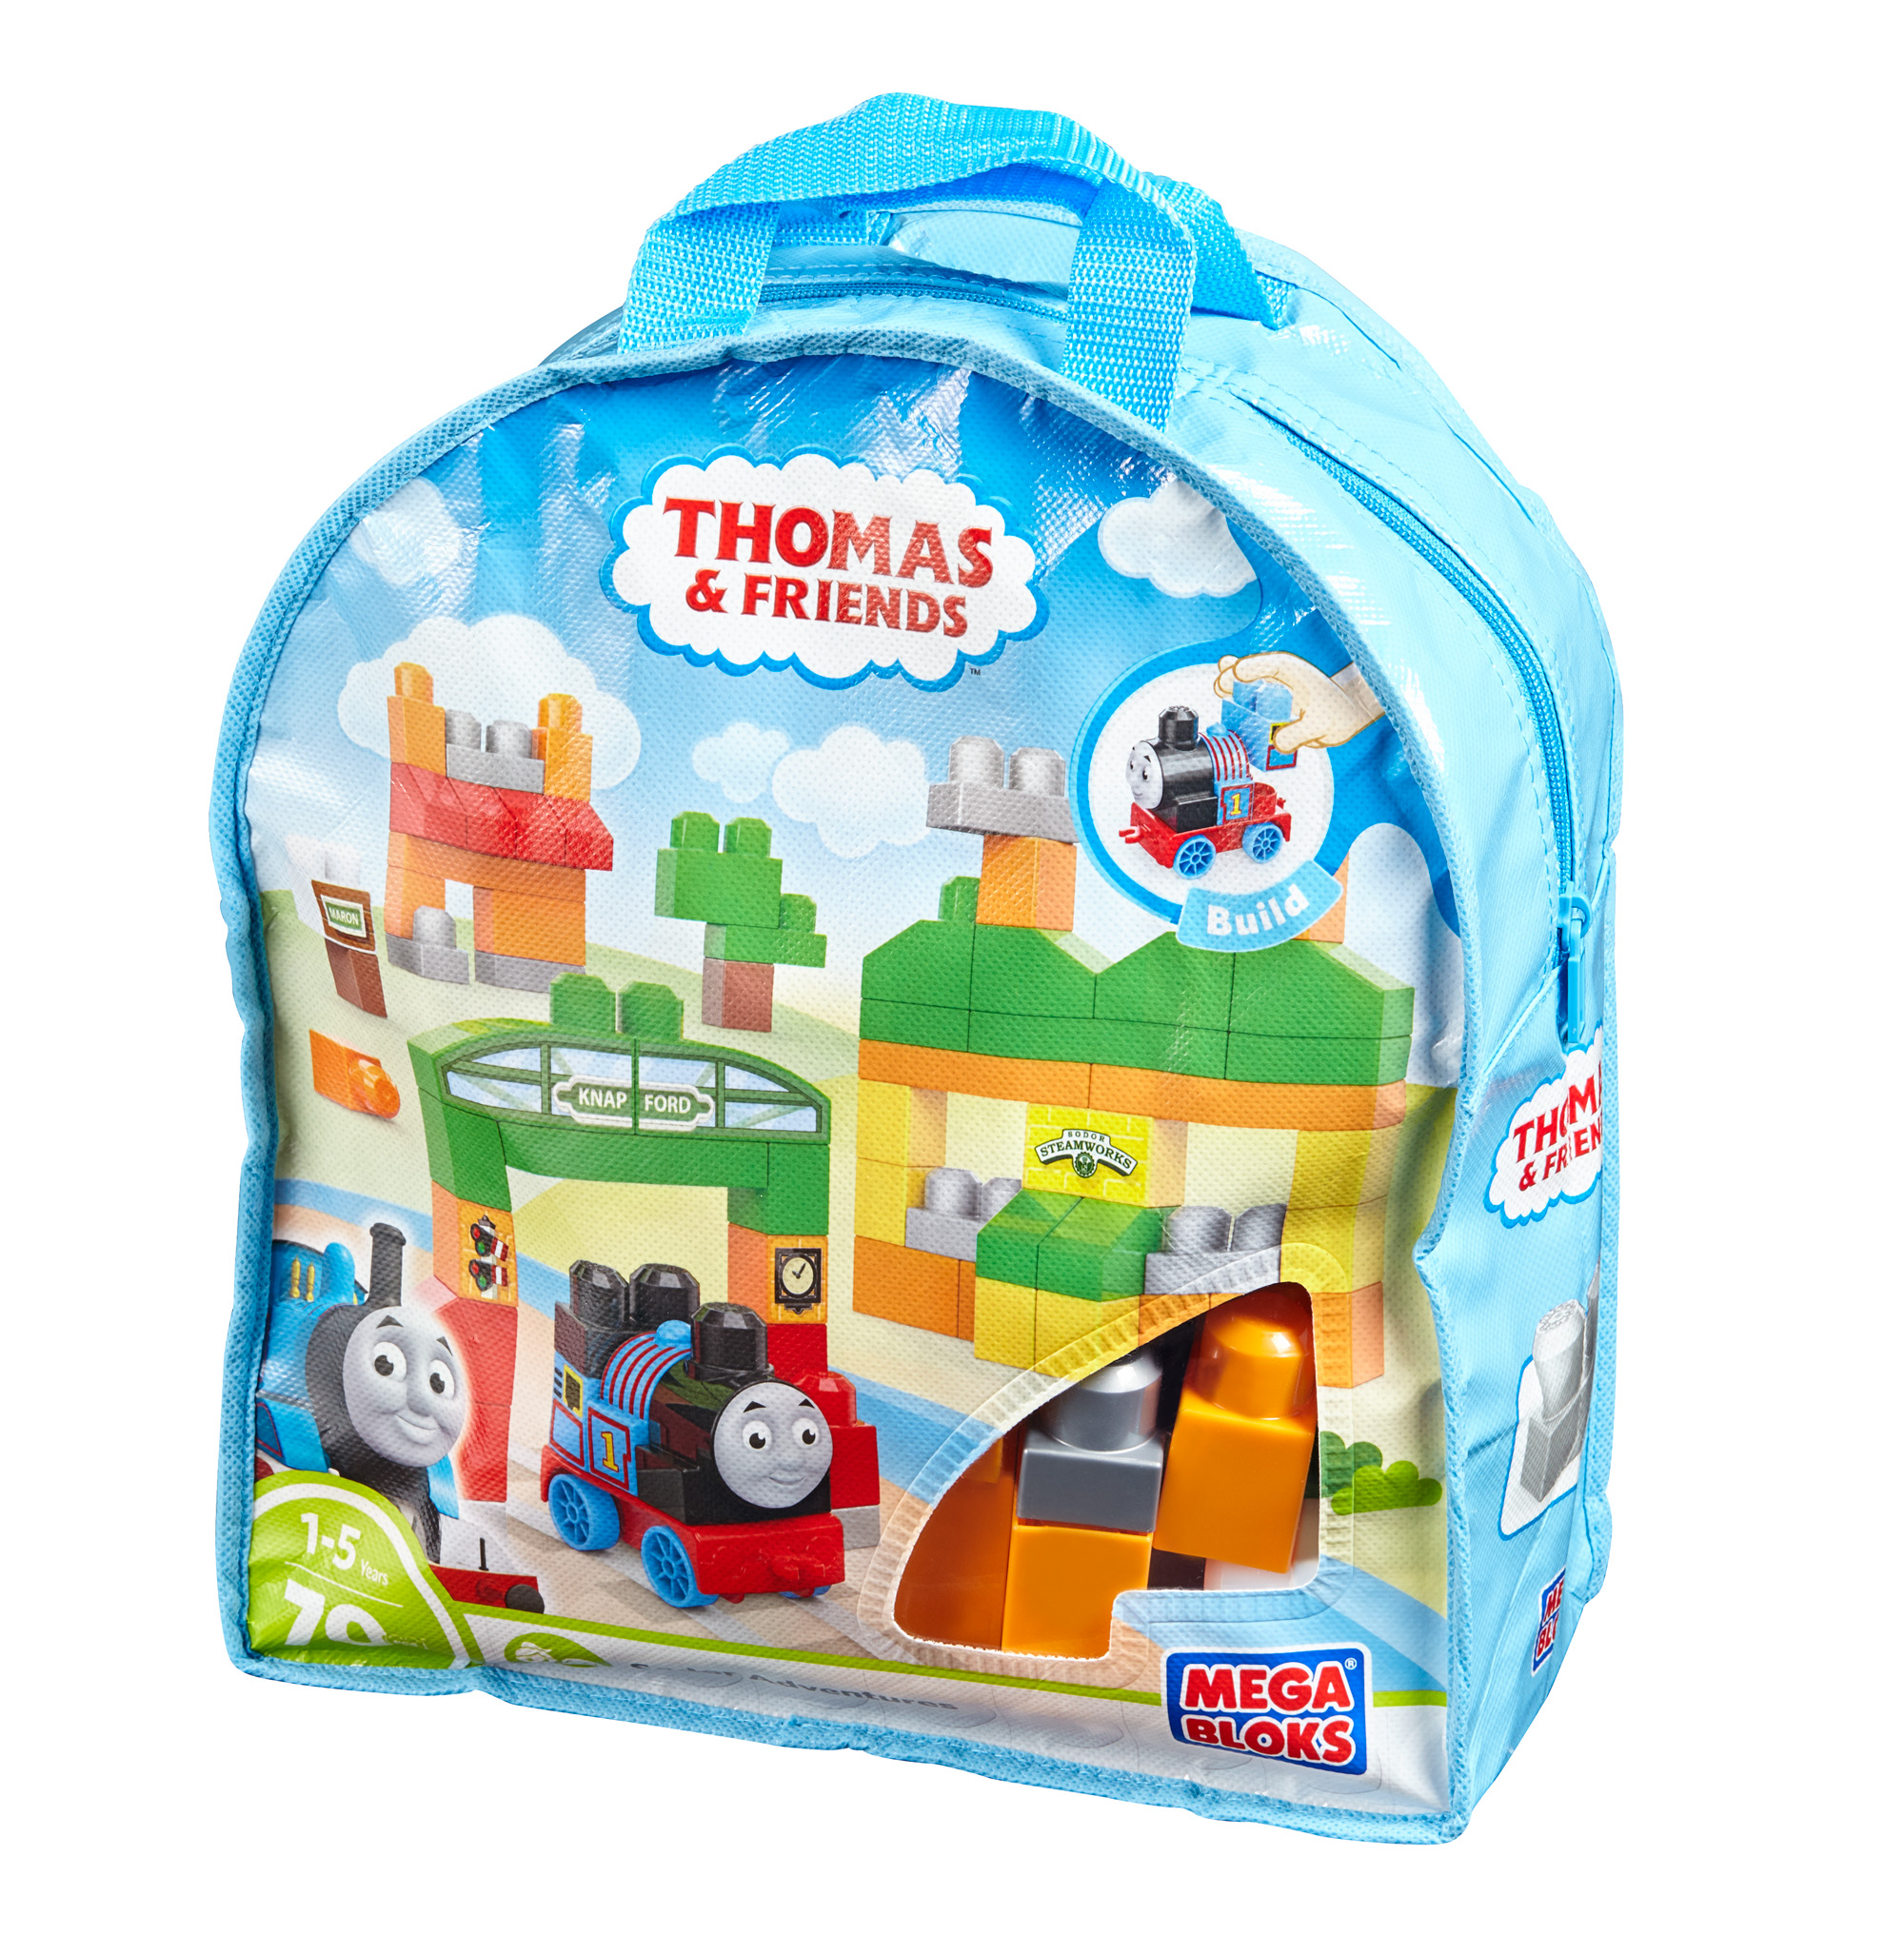 Mega Bloks Thomas & Friends Thomas Sodor Adventures Building Bag by Mega Bloks